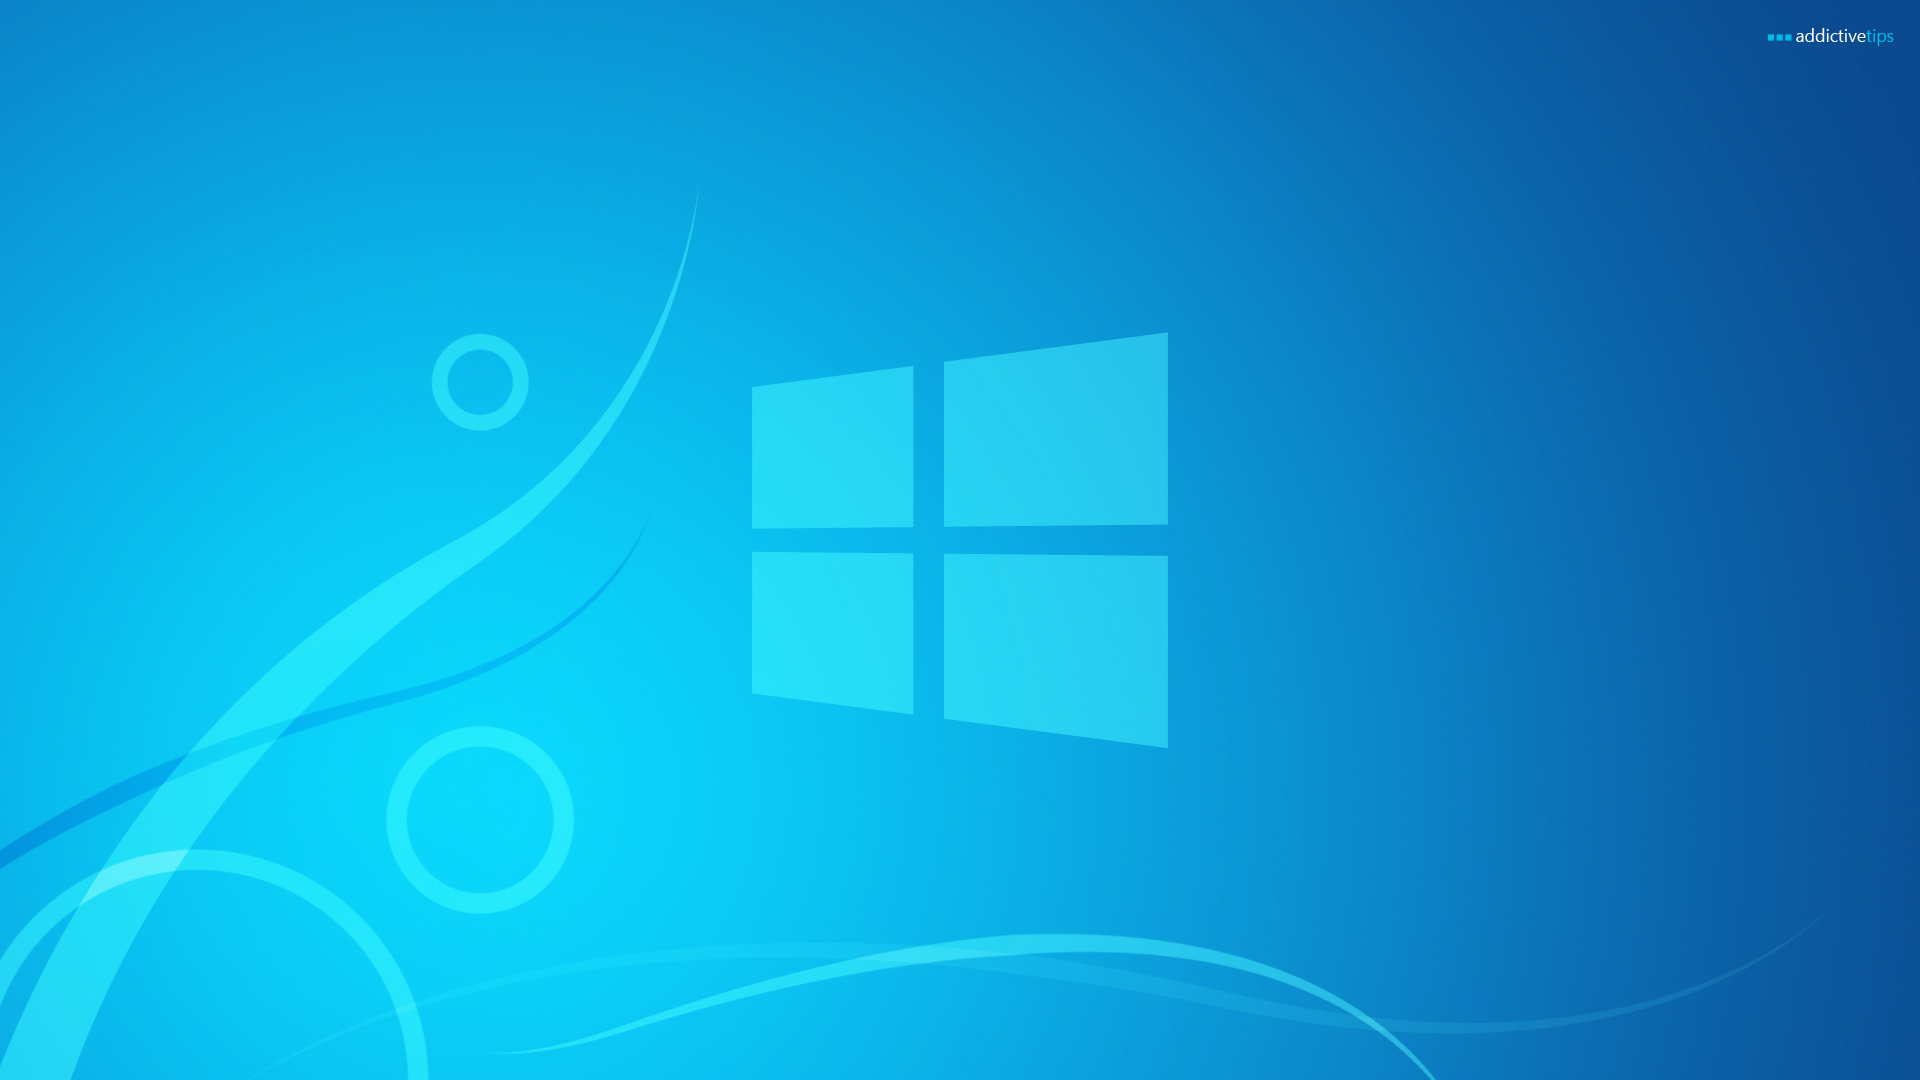 Windows 8 Wallpaper Hd - HD Wallpaper